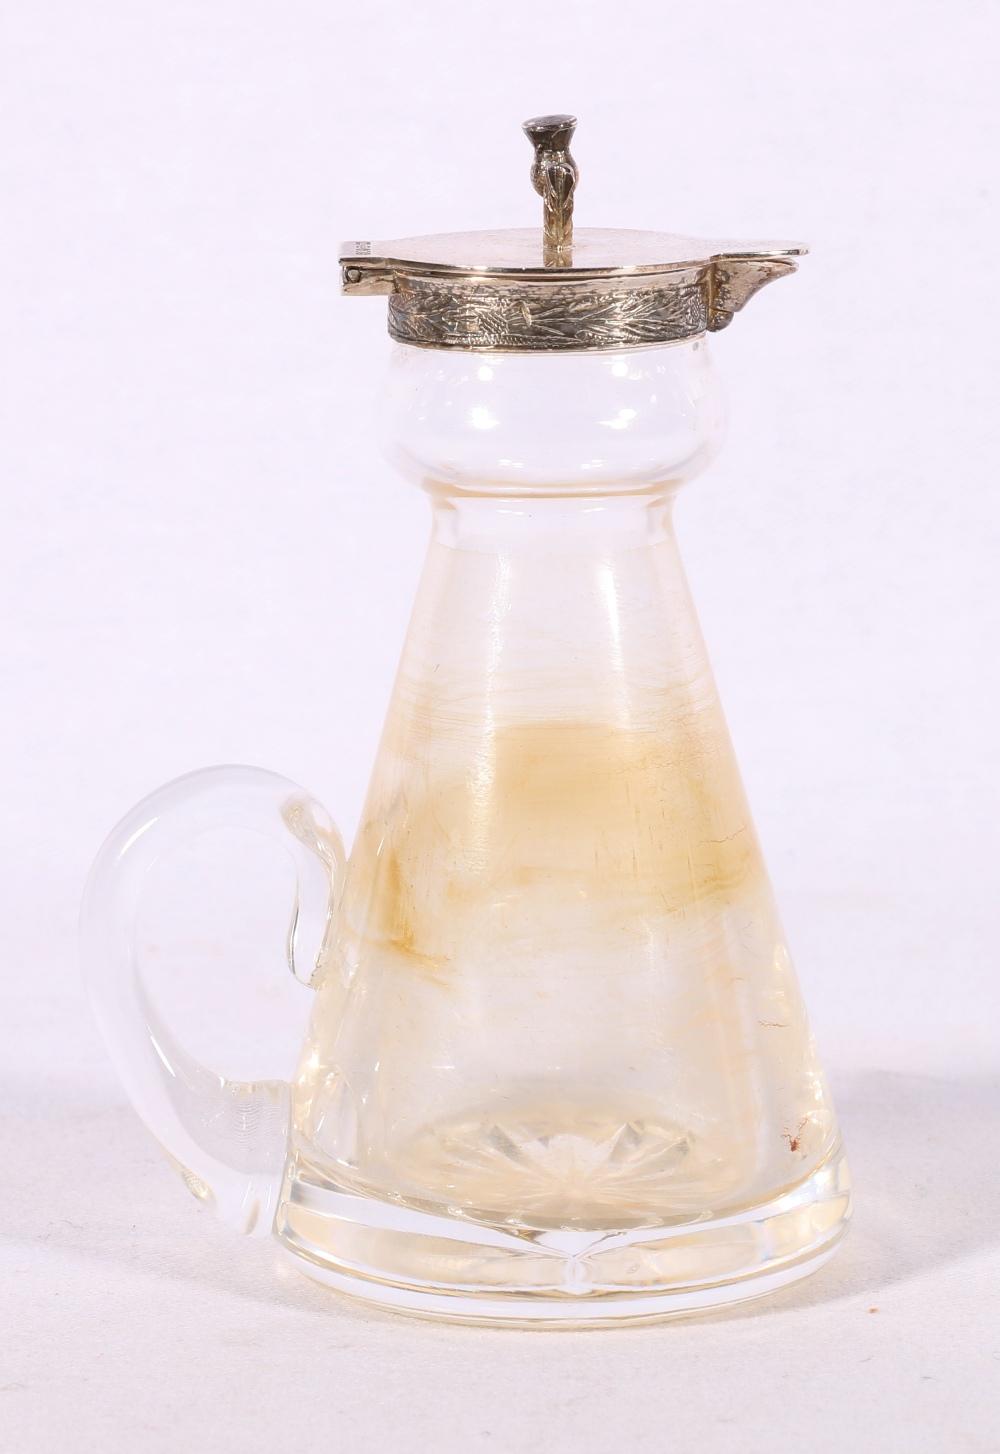 Royal Brierley glass whisky noggin with silver thistle mounts byHayward & Stott (Scottish